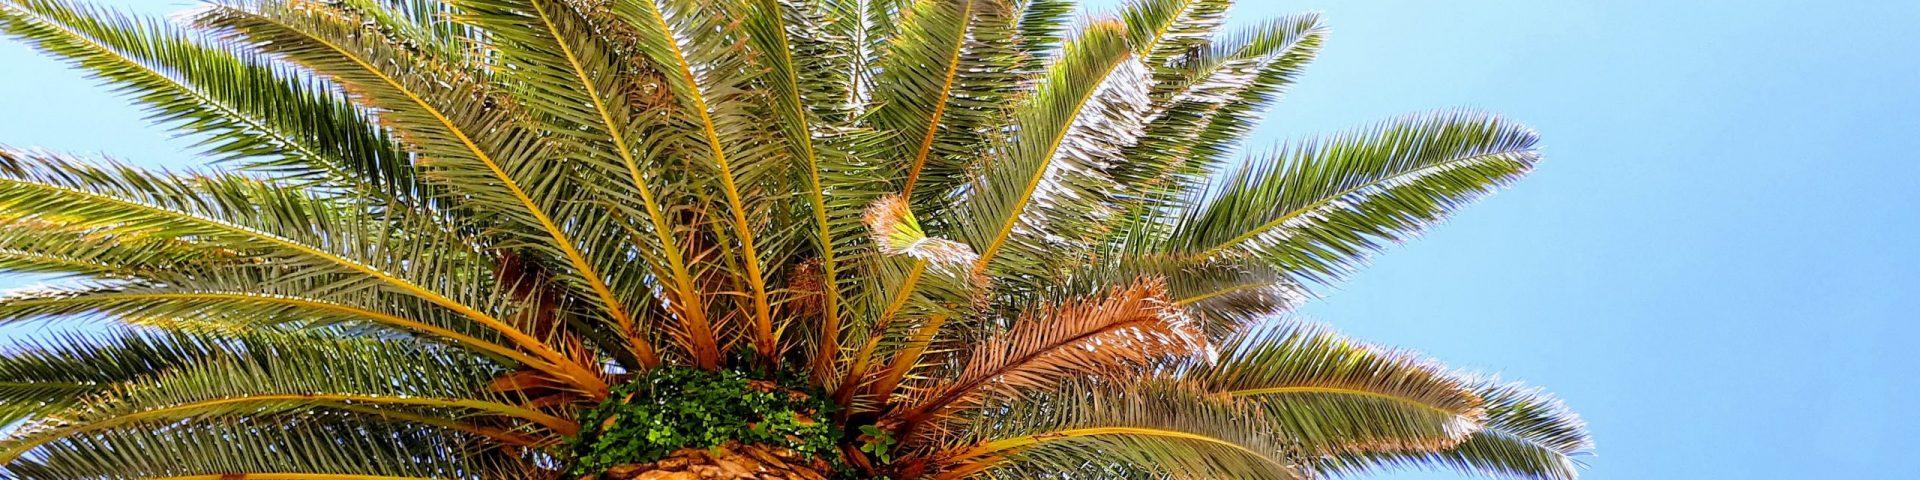 Palm banner